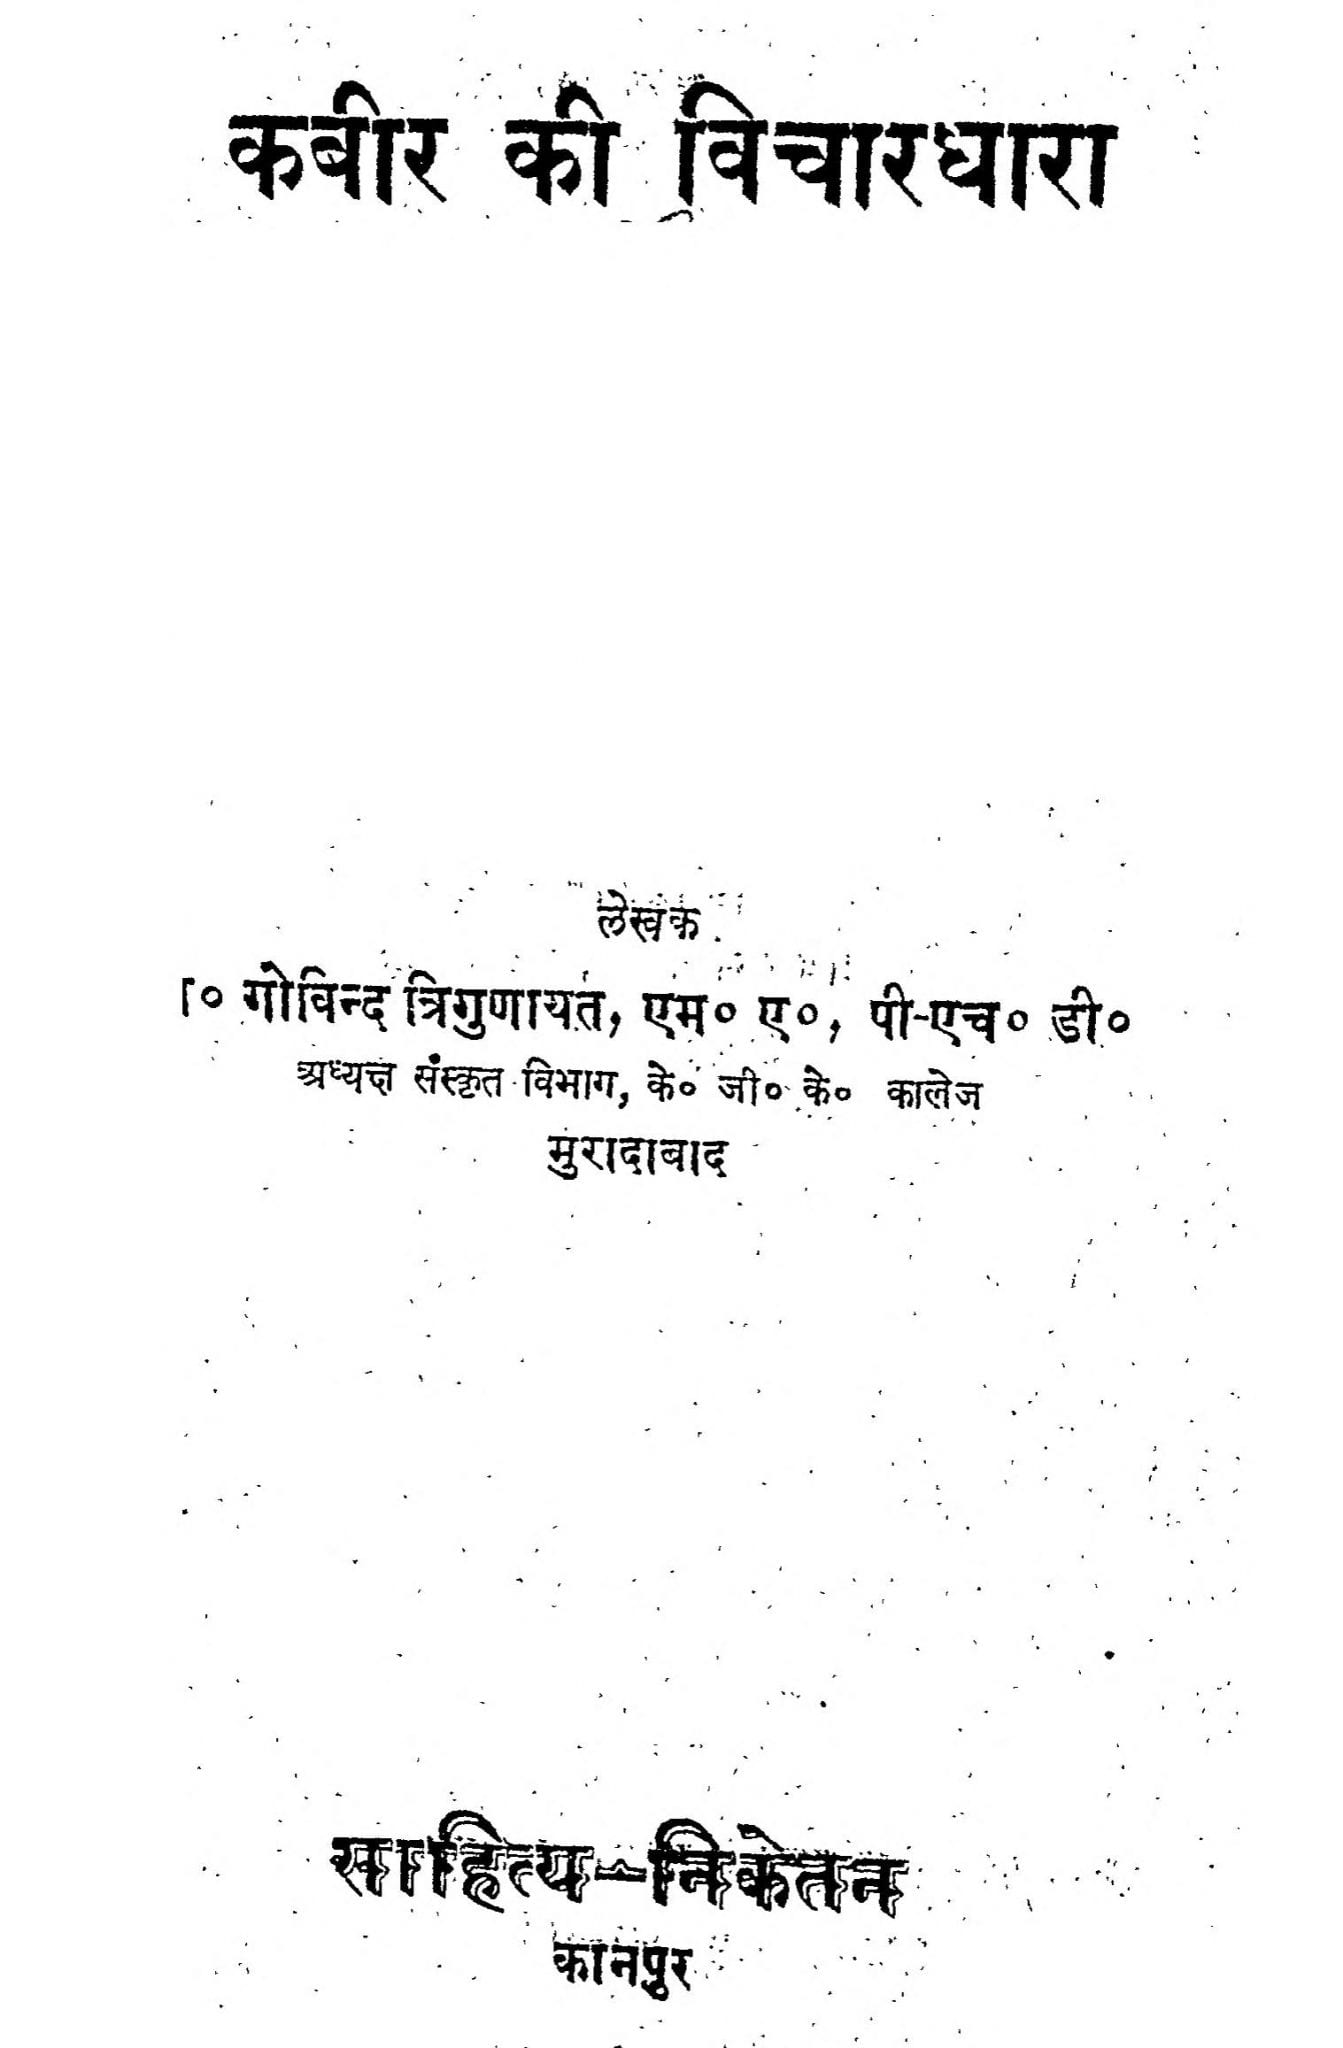 Book Image : कबीर की विचारधारा - Kabeer Ki Vichardhara